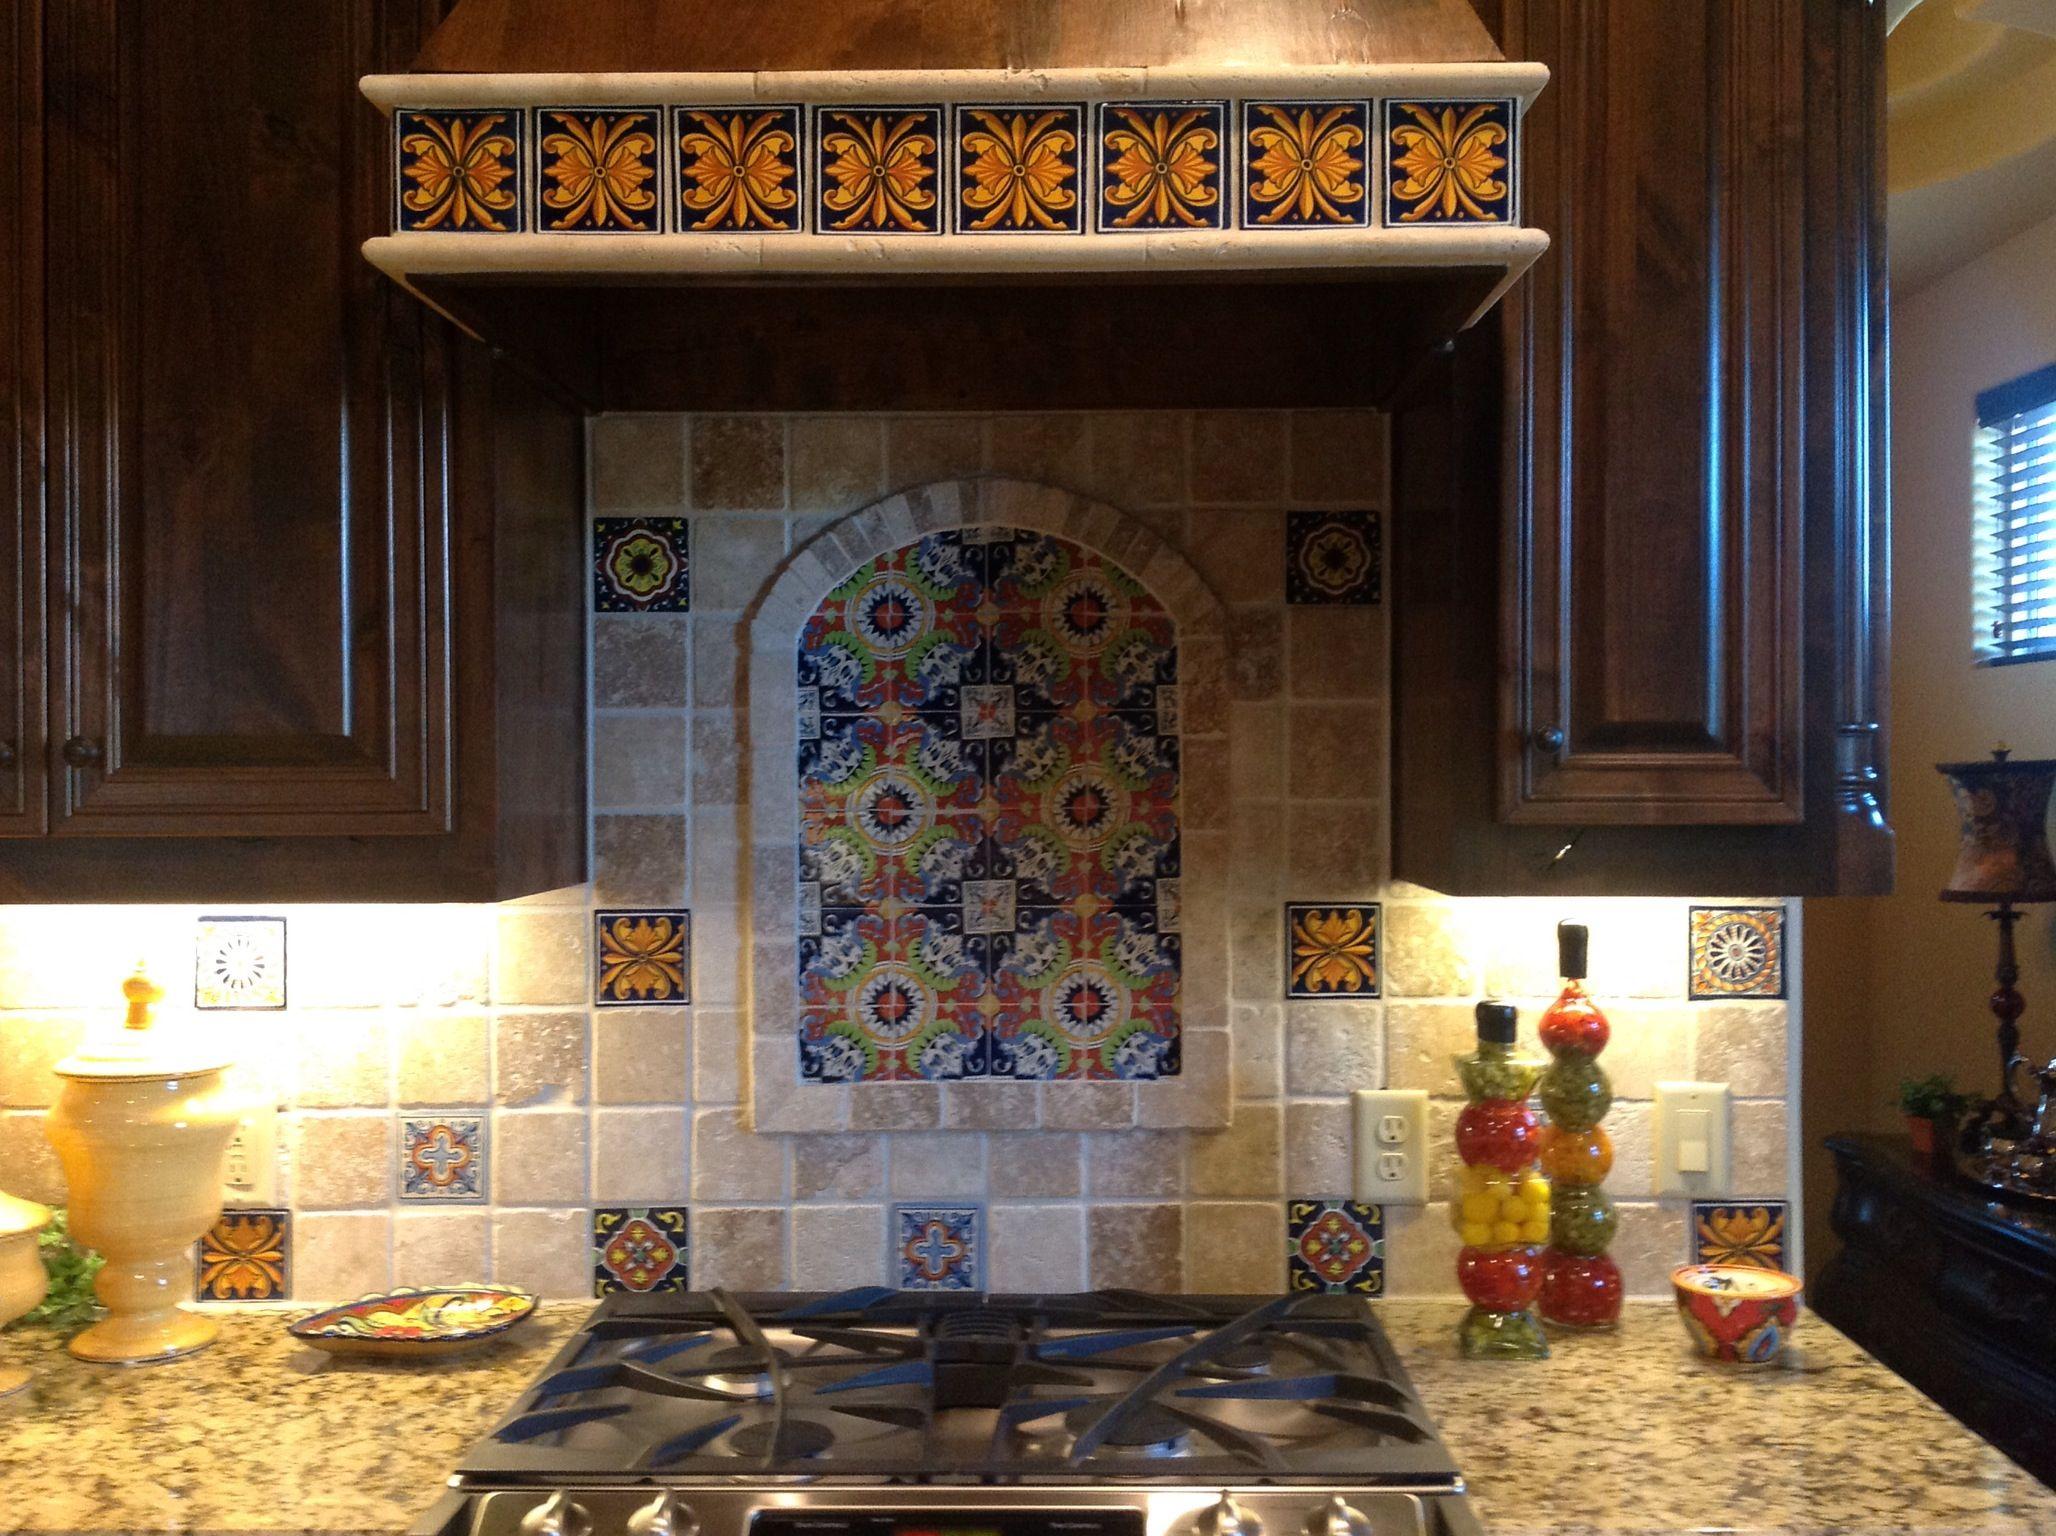 Talavera backsplash for the home pinterest for Mexican tile kitchen ideas